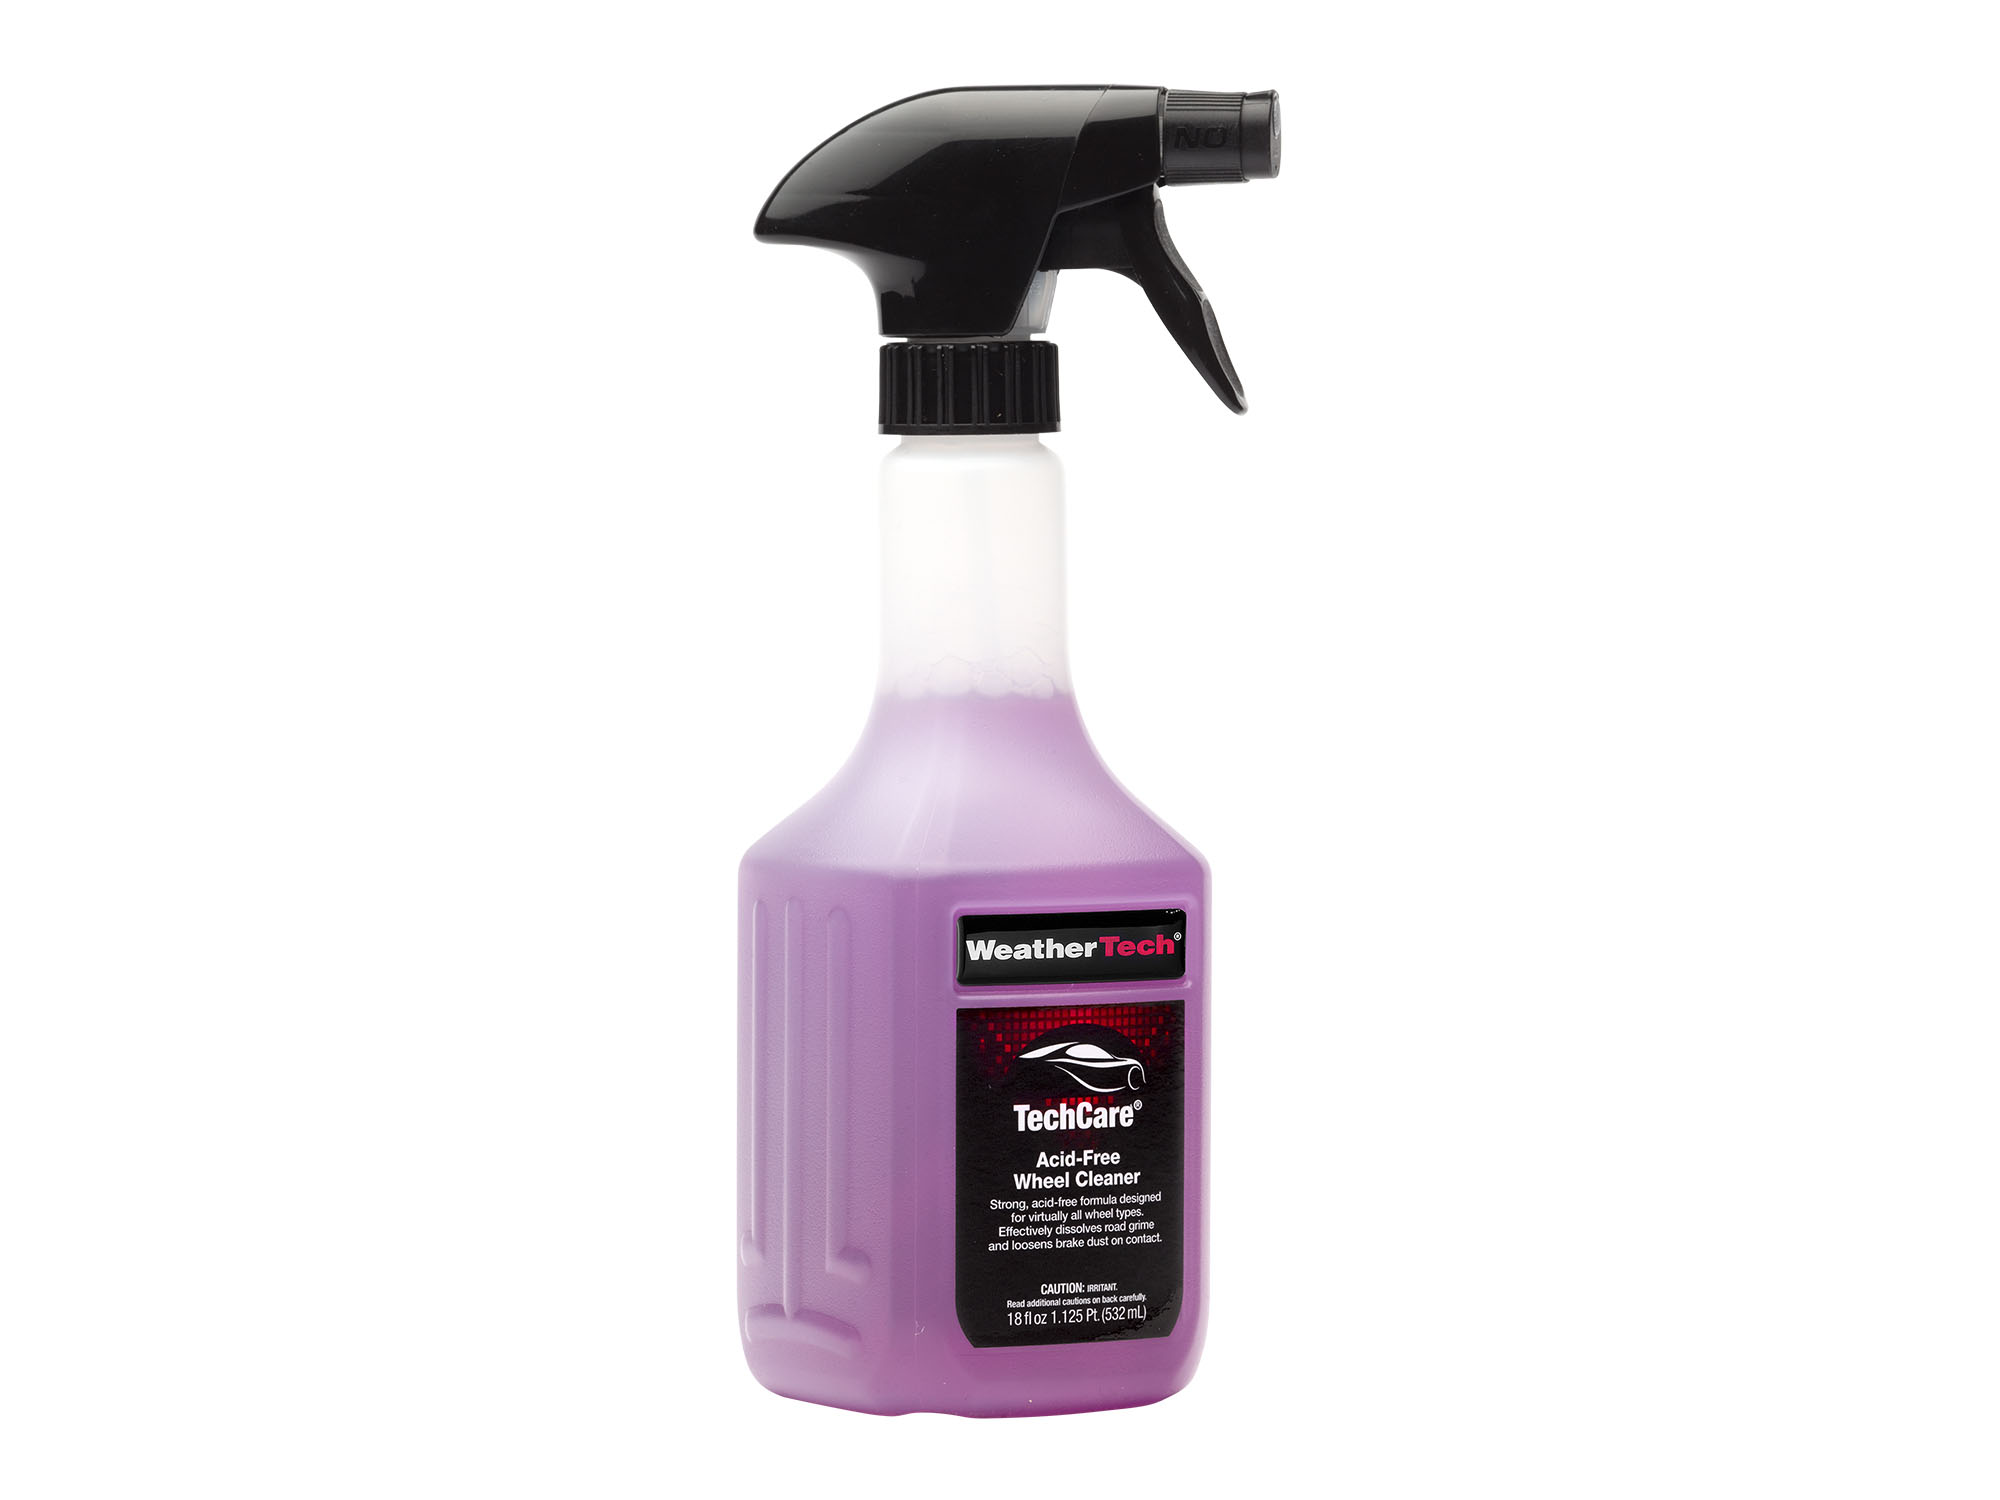 Bottle of TechCare Acid-Free Wheel Cleaner.